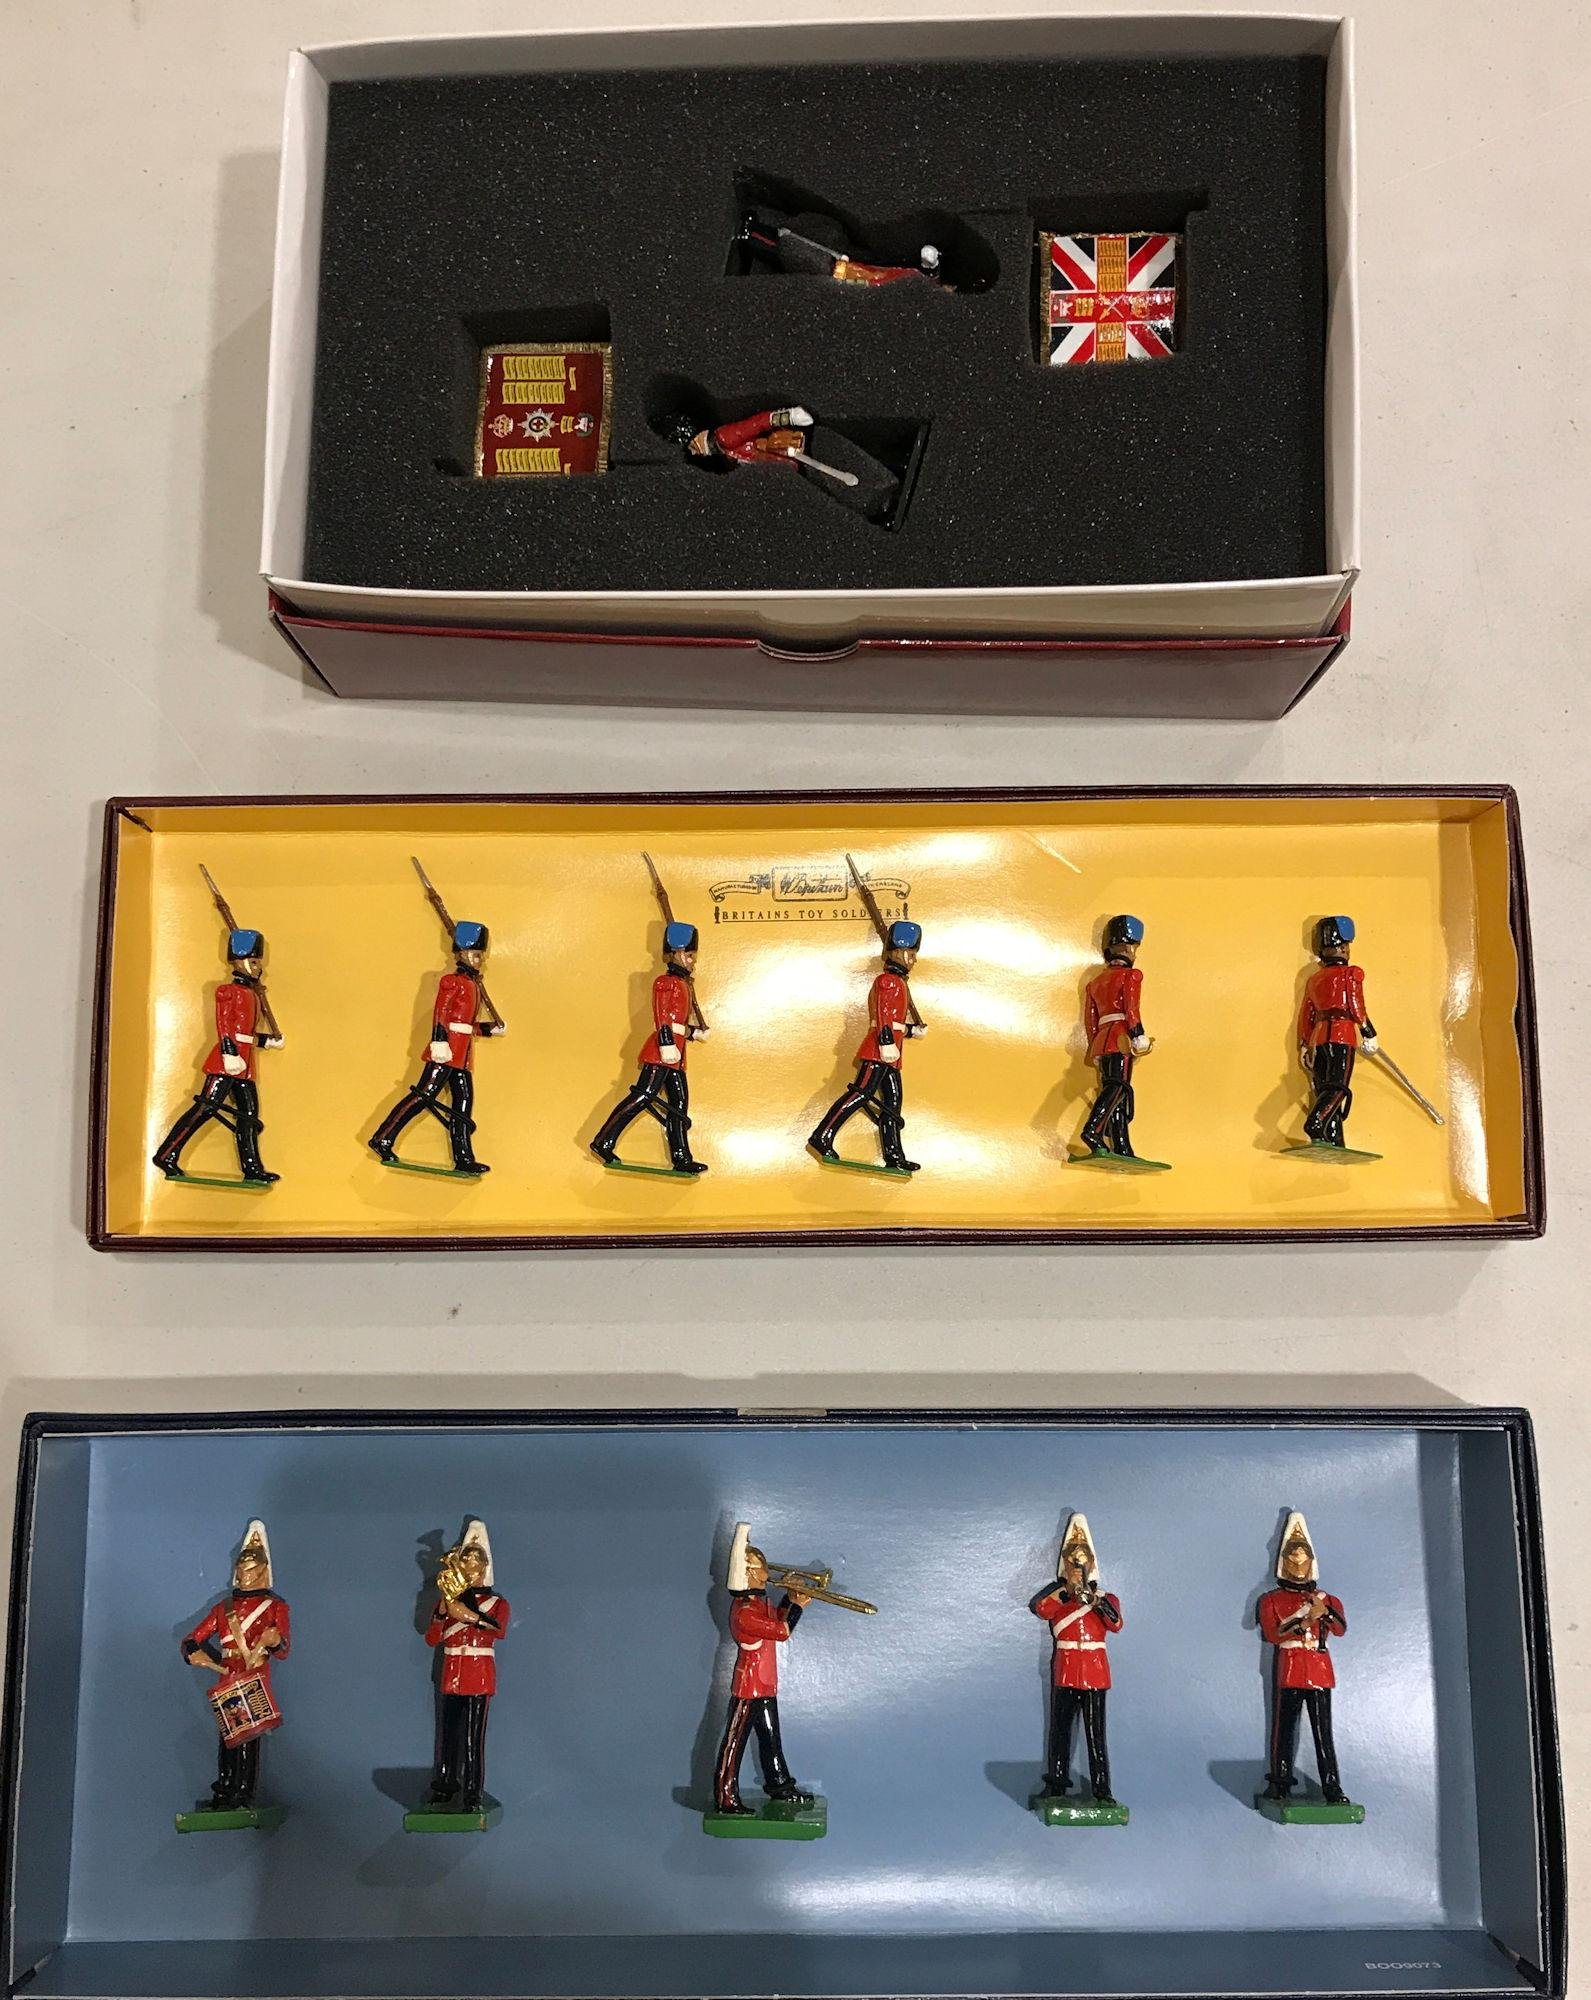 LOT 3 SETS BRITAINS SOLDIERS - 2 QUEEN'S DIAMOND